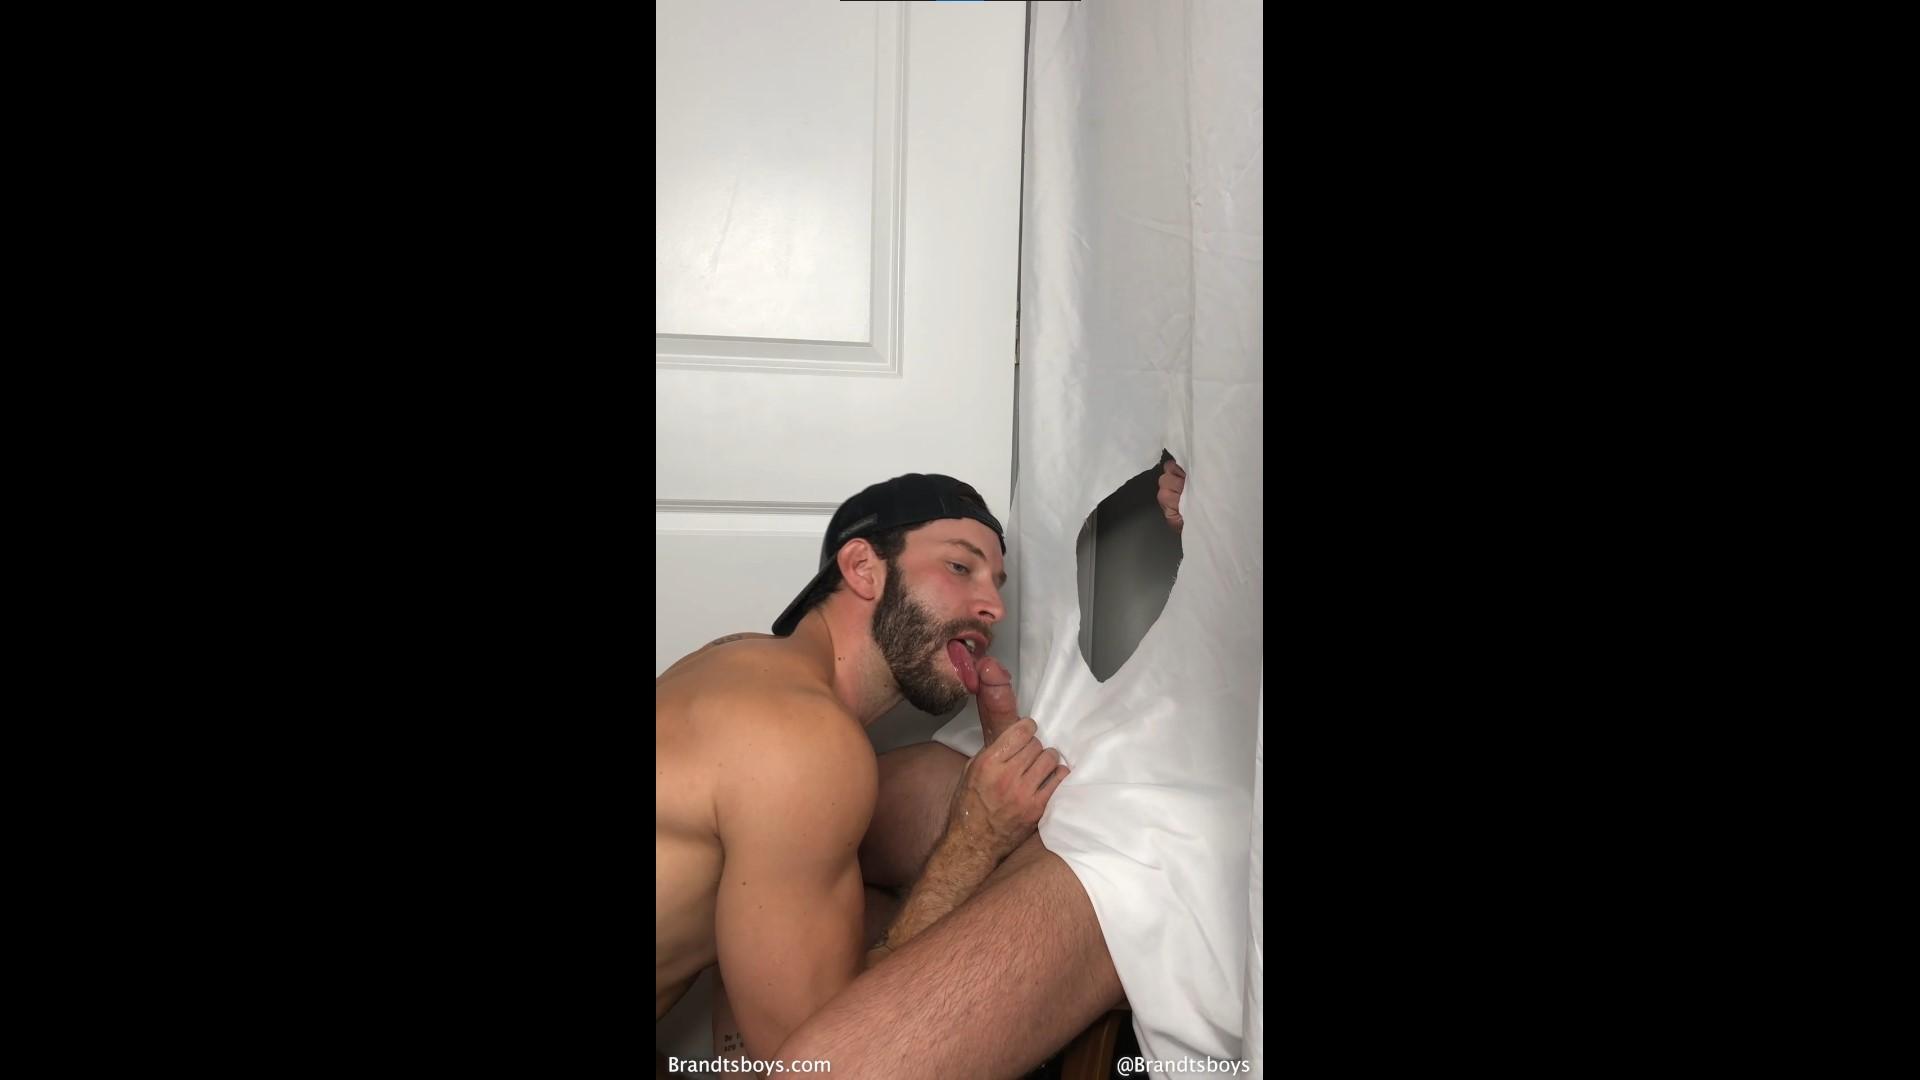 Troy gets a blowjob from Kyle - TroyxBrandt - KylexBrandt